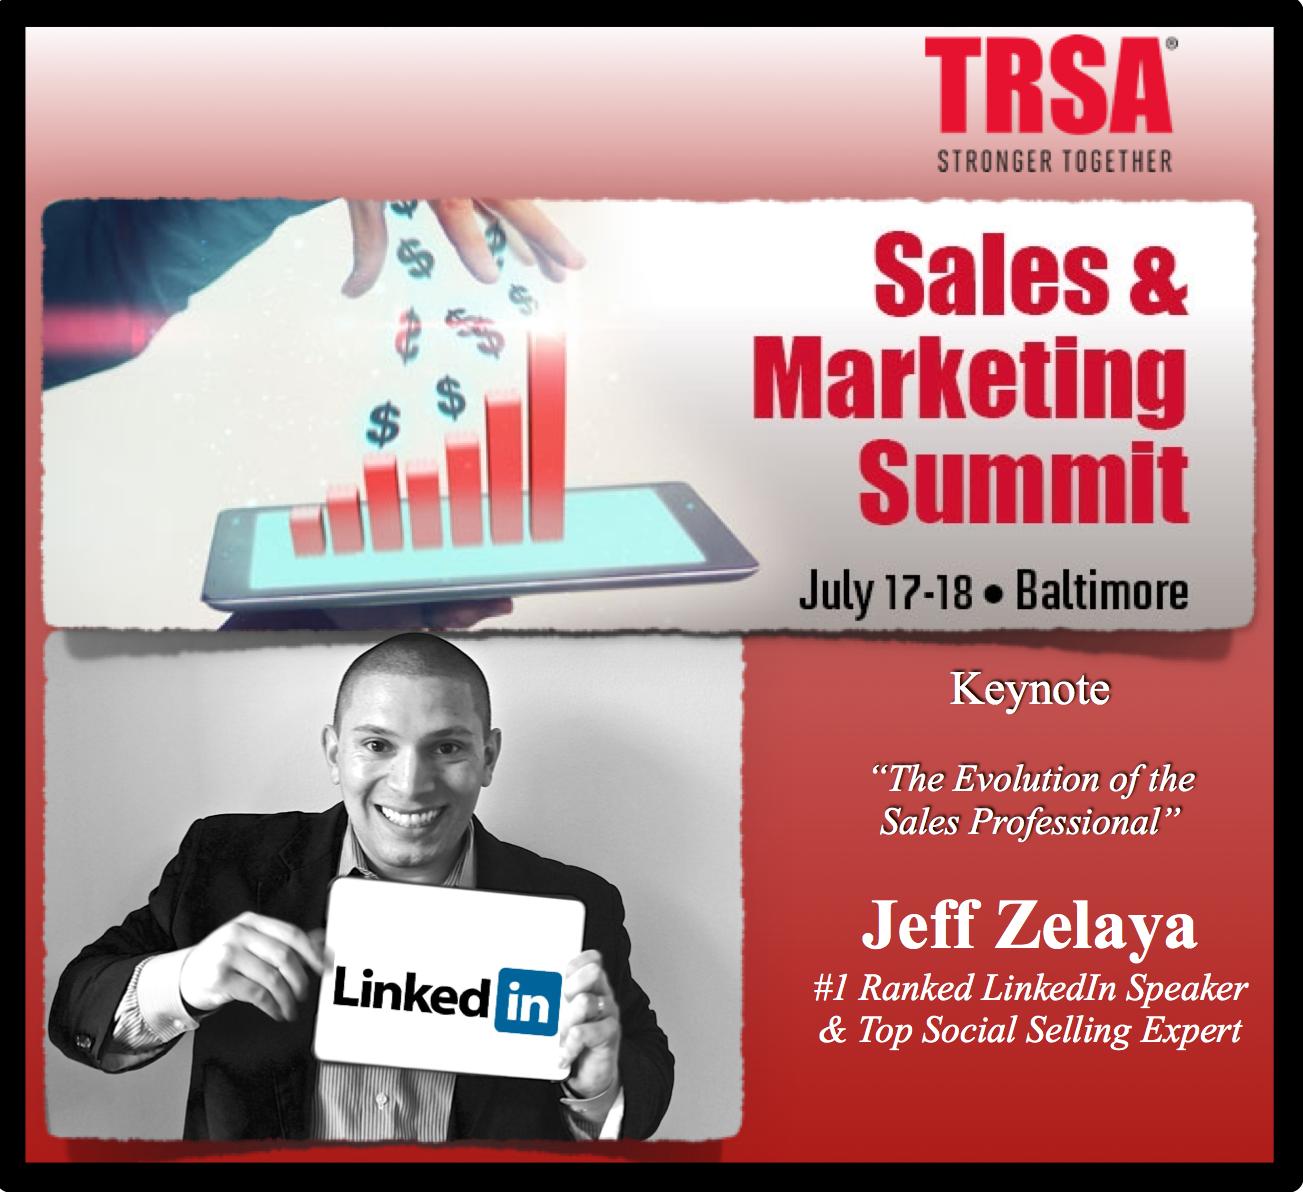 Keynote Social Selling Speaker at TRSA